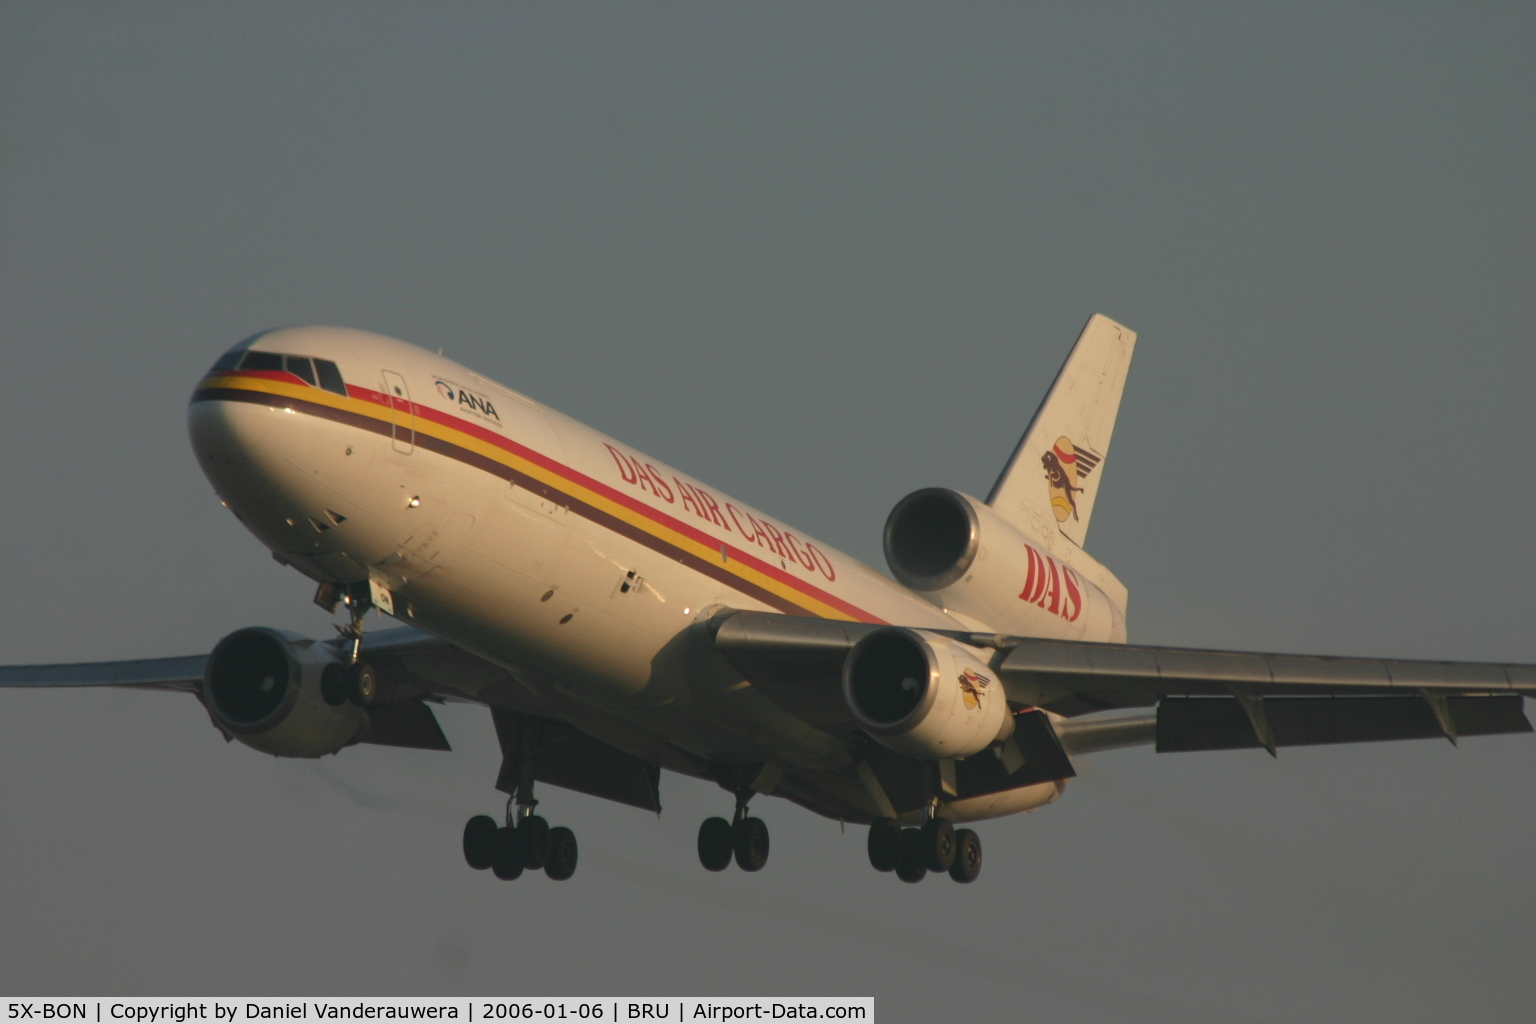 5X-BON, 1975 McDonnell Douglas DC-10-30 C/N 46921, arrival on rwy 25L